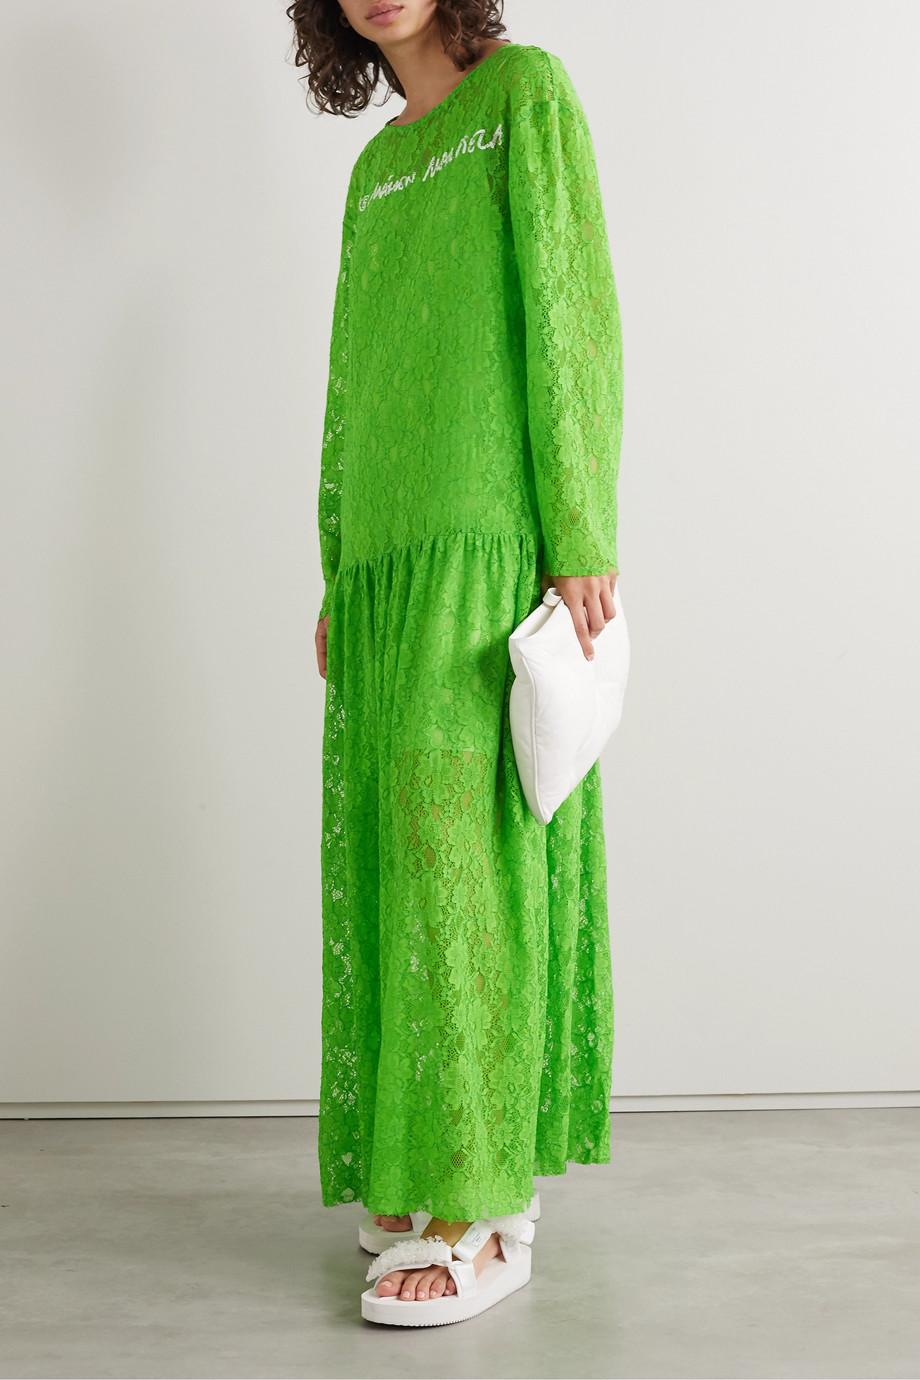 MM6 Maison Margiela Oversized printed corded lace maxi dress